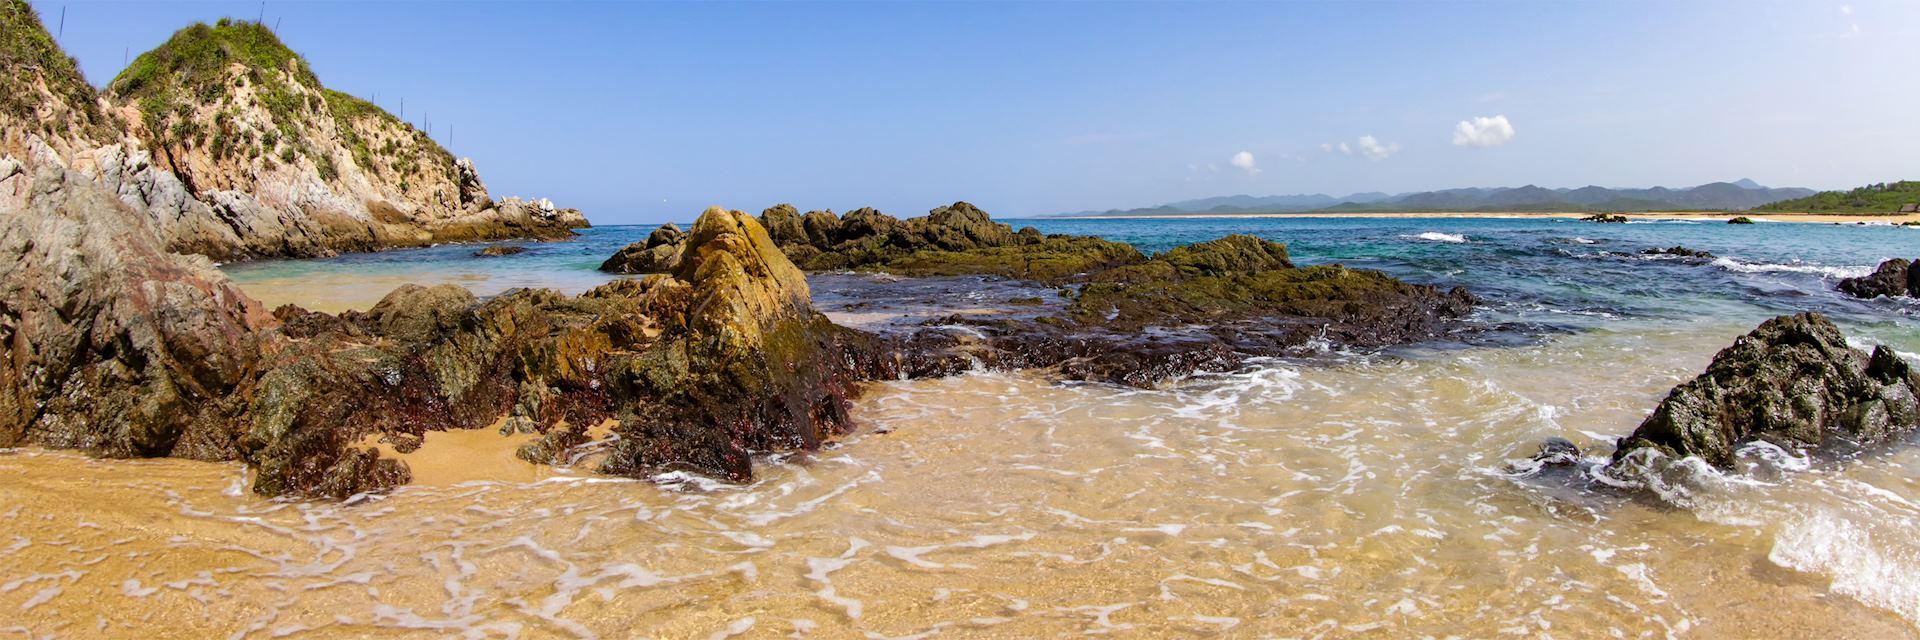 Mayto Beach near Costalegre